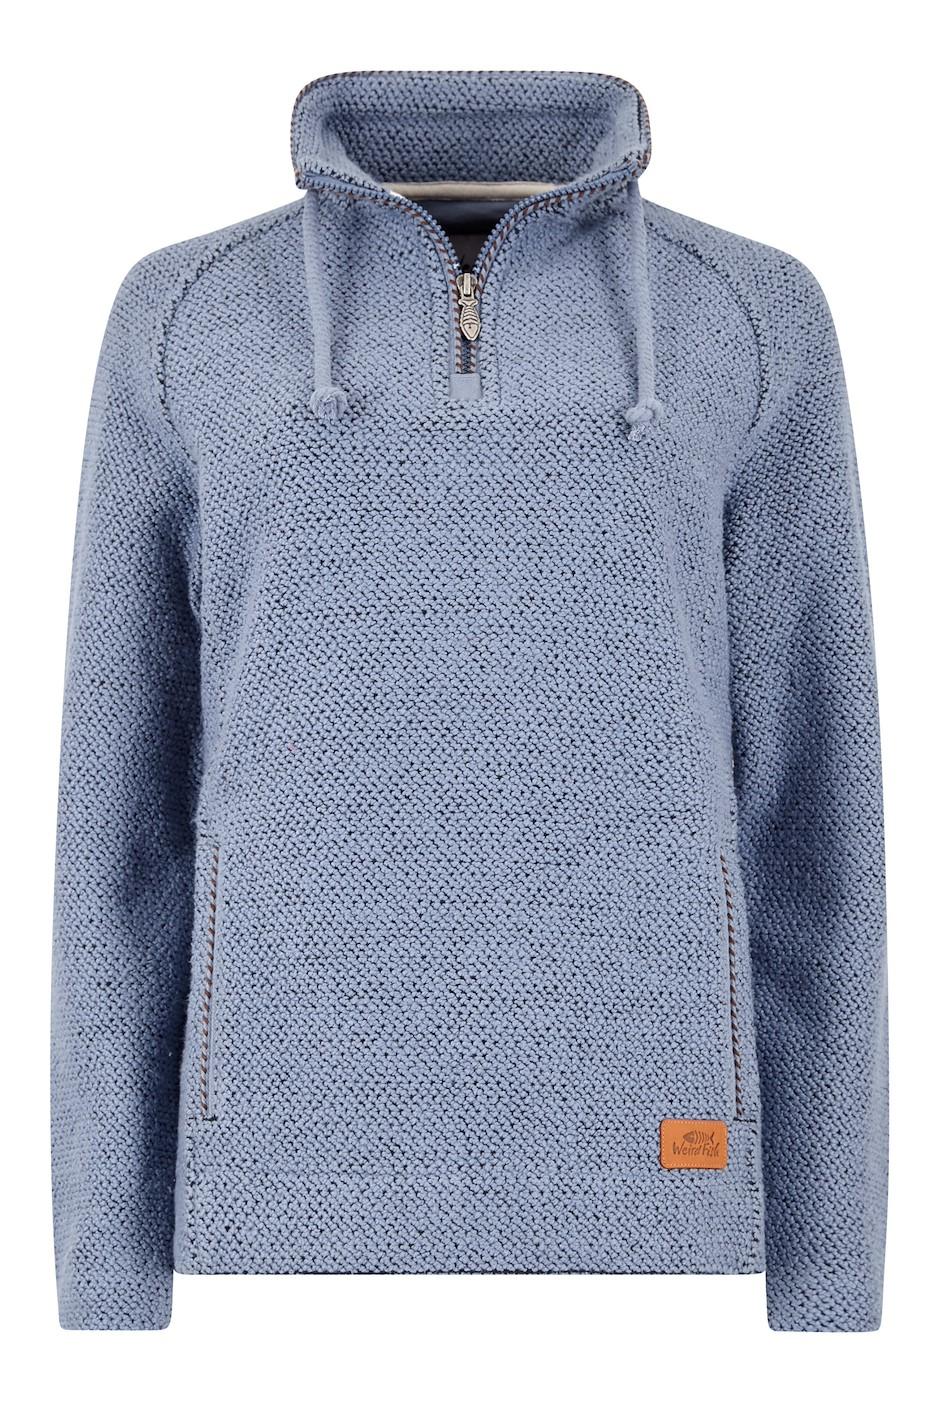 Geranium 1/4 Zip Classic Macaroni Sweatshirt Light Blue